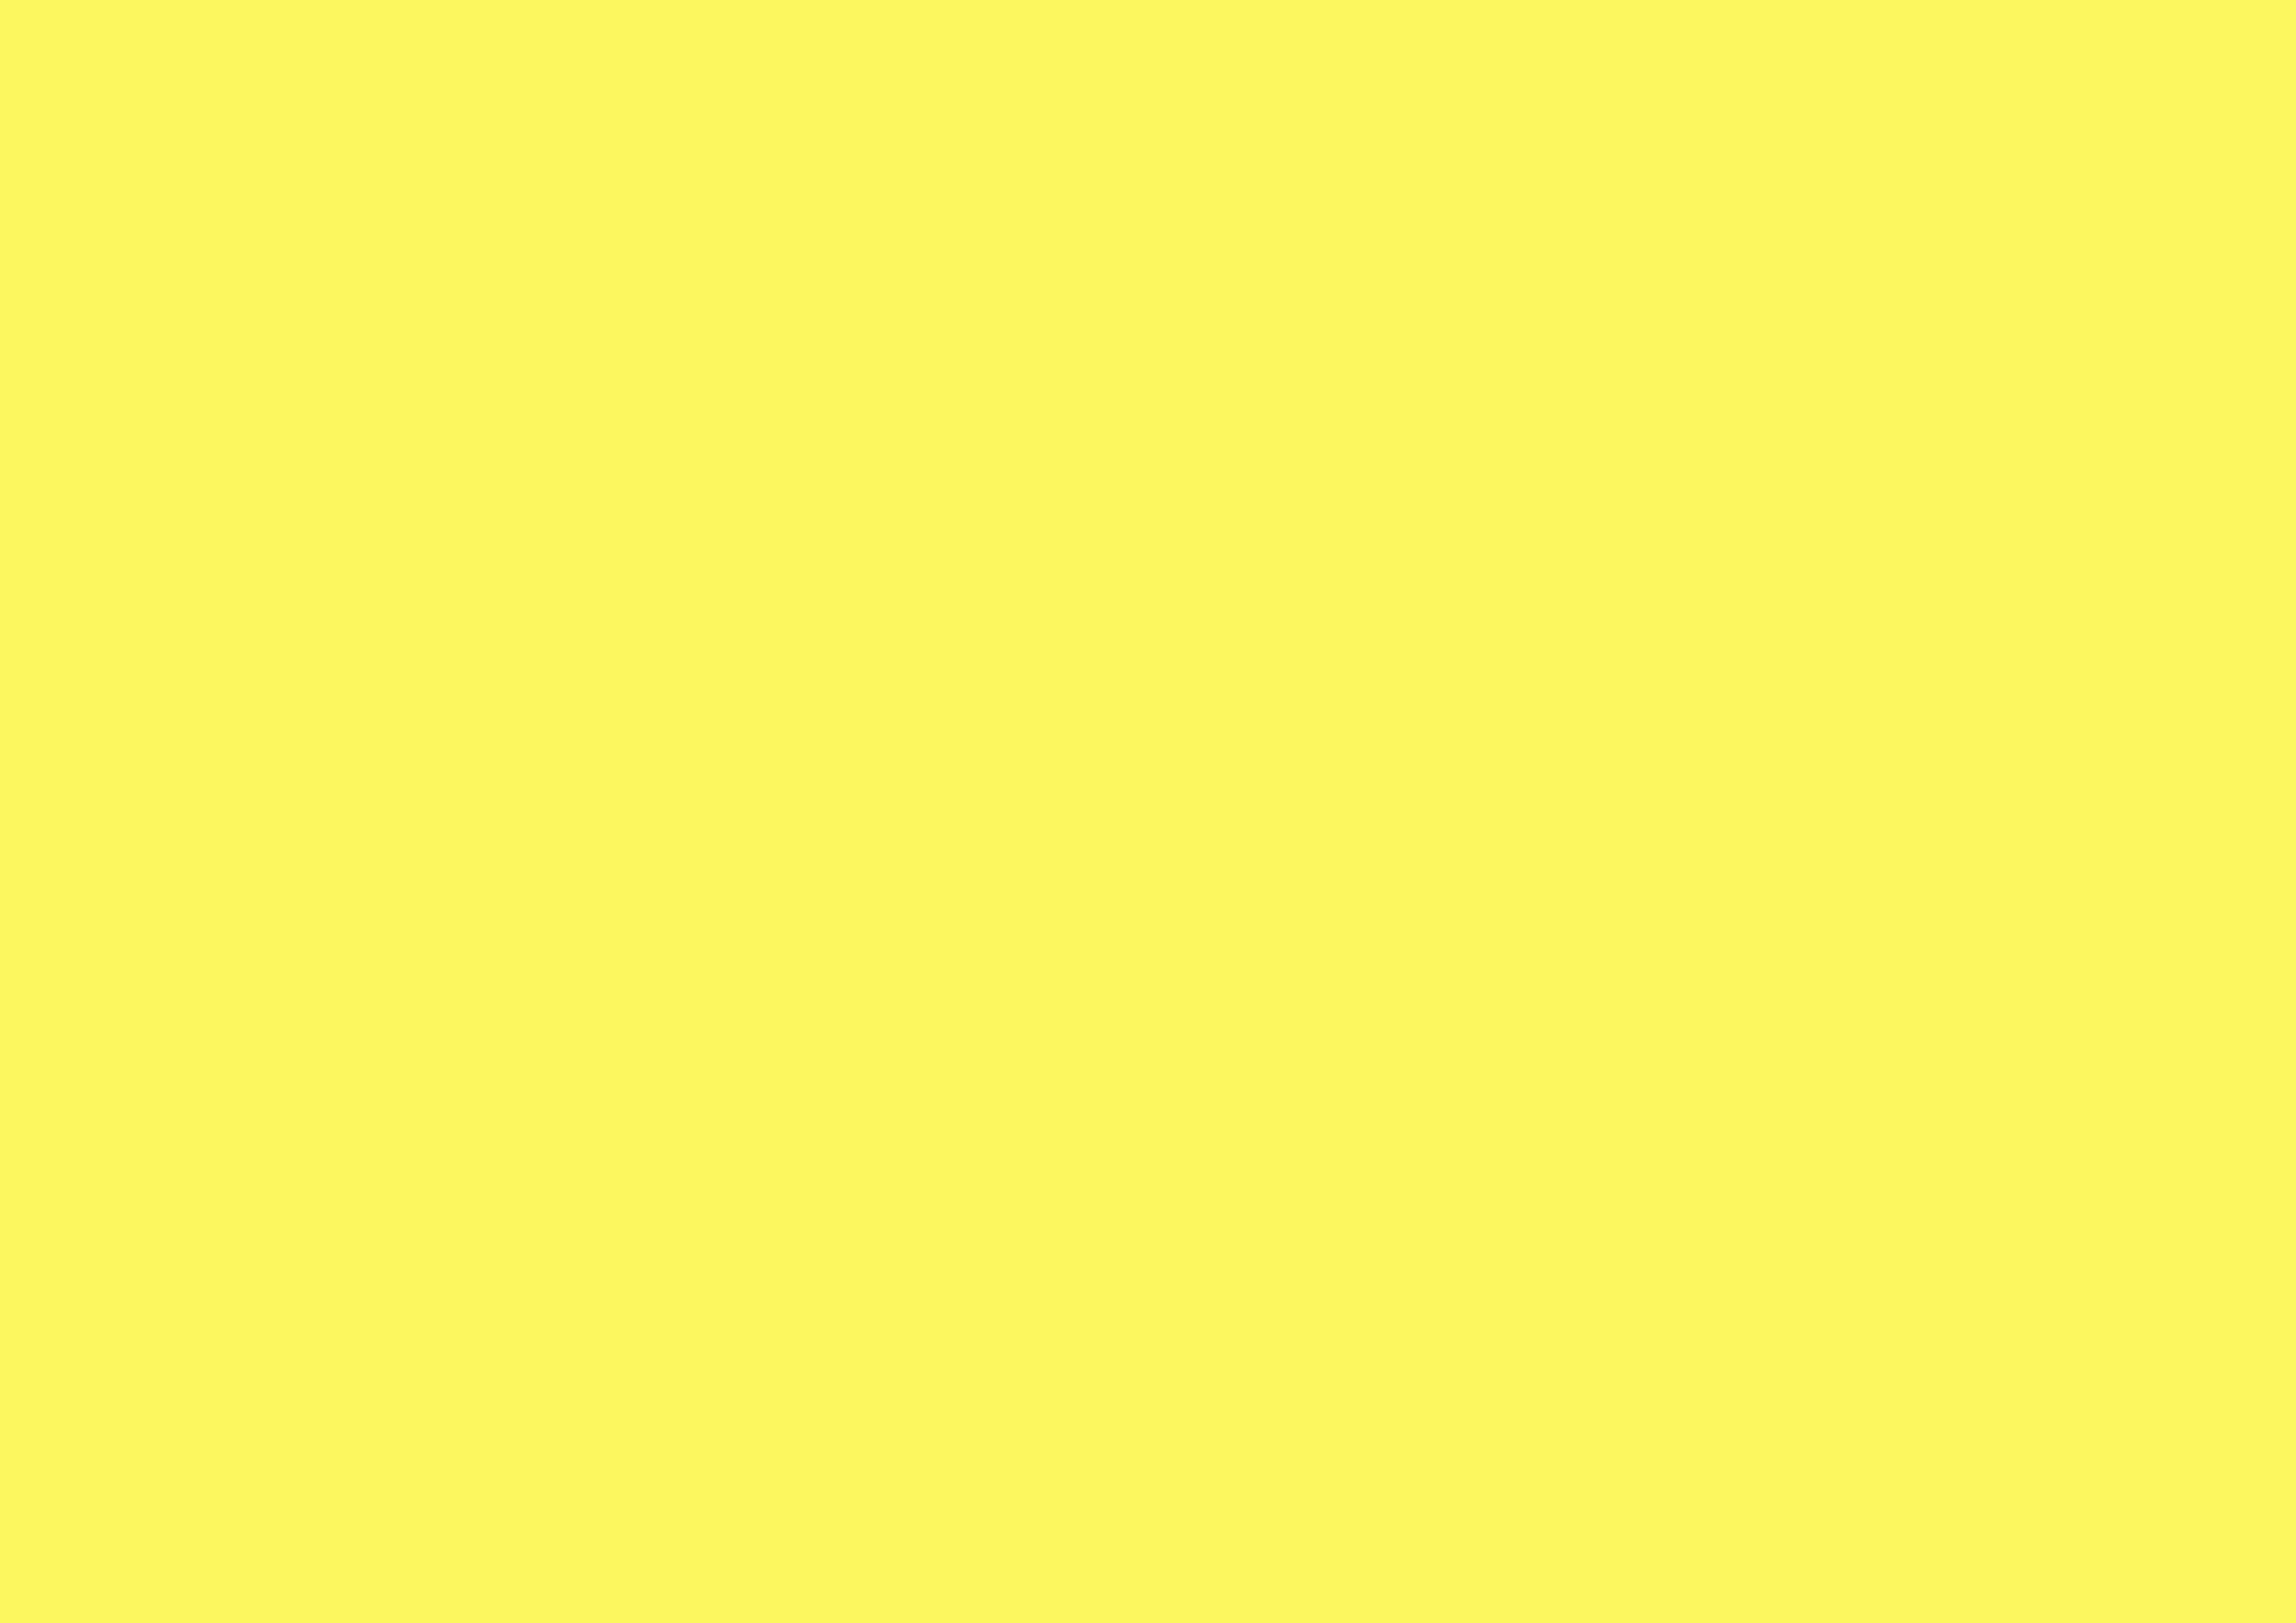 3508x2480 Icterine Solid Color Background